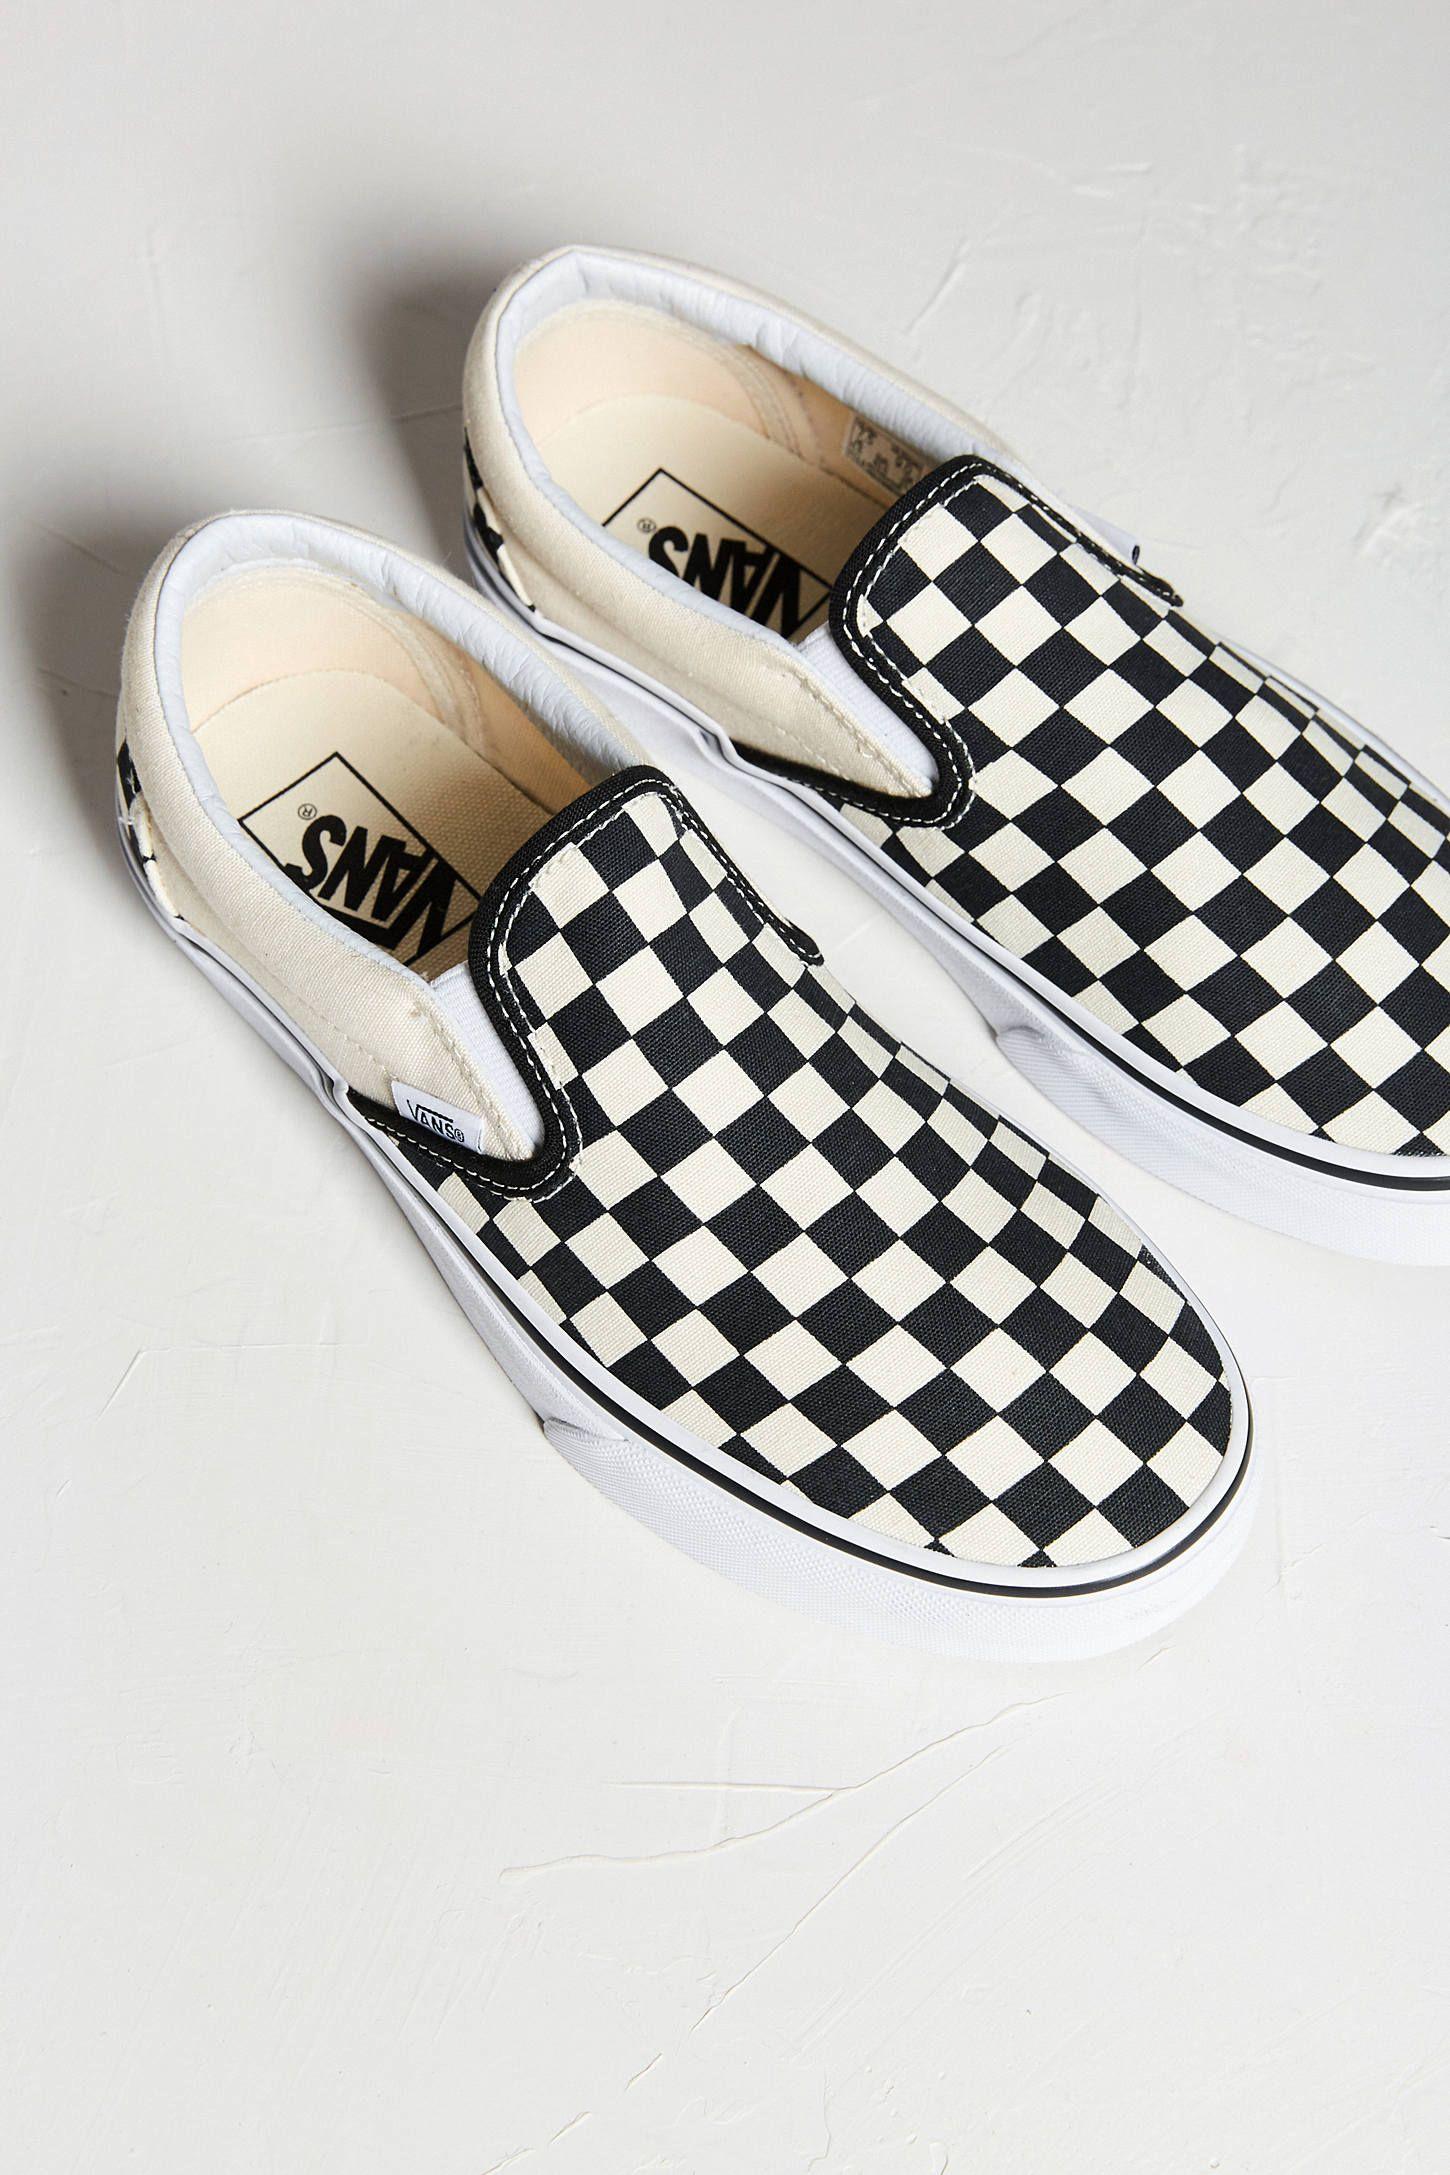 a5e602133a0 Vans Checkerboard Slip-On Sneaker in 2019 | WISHLIST - Vans ...